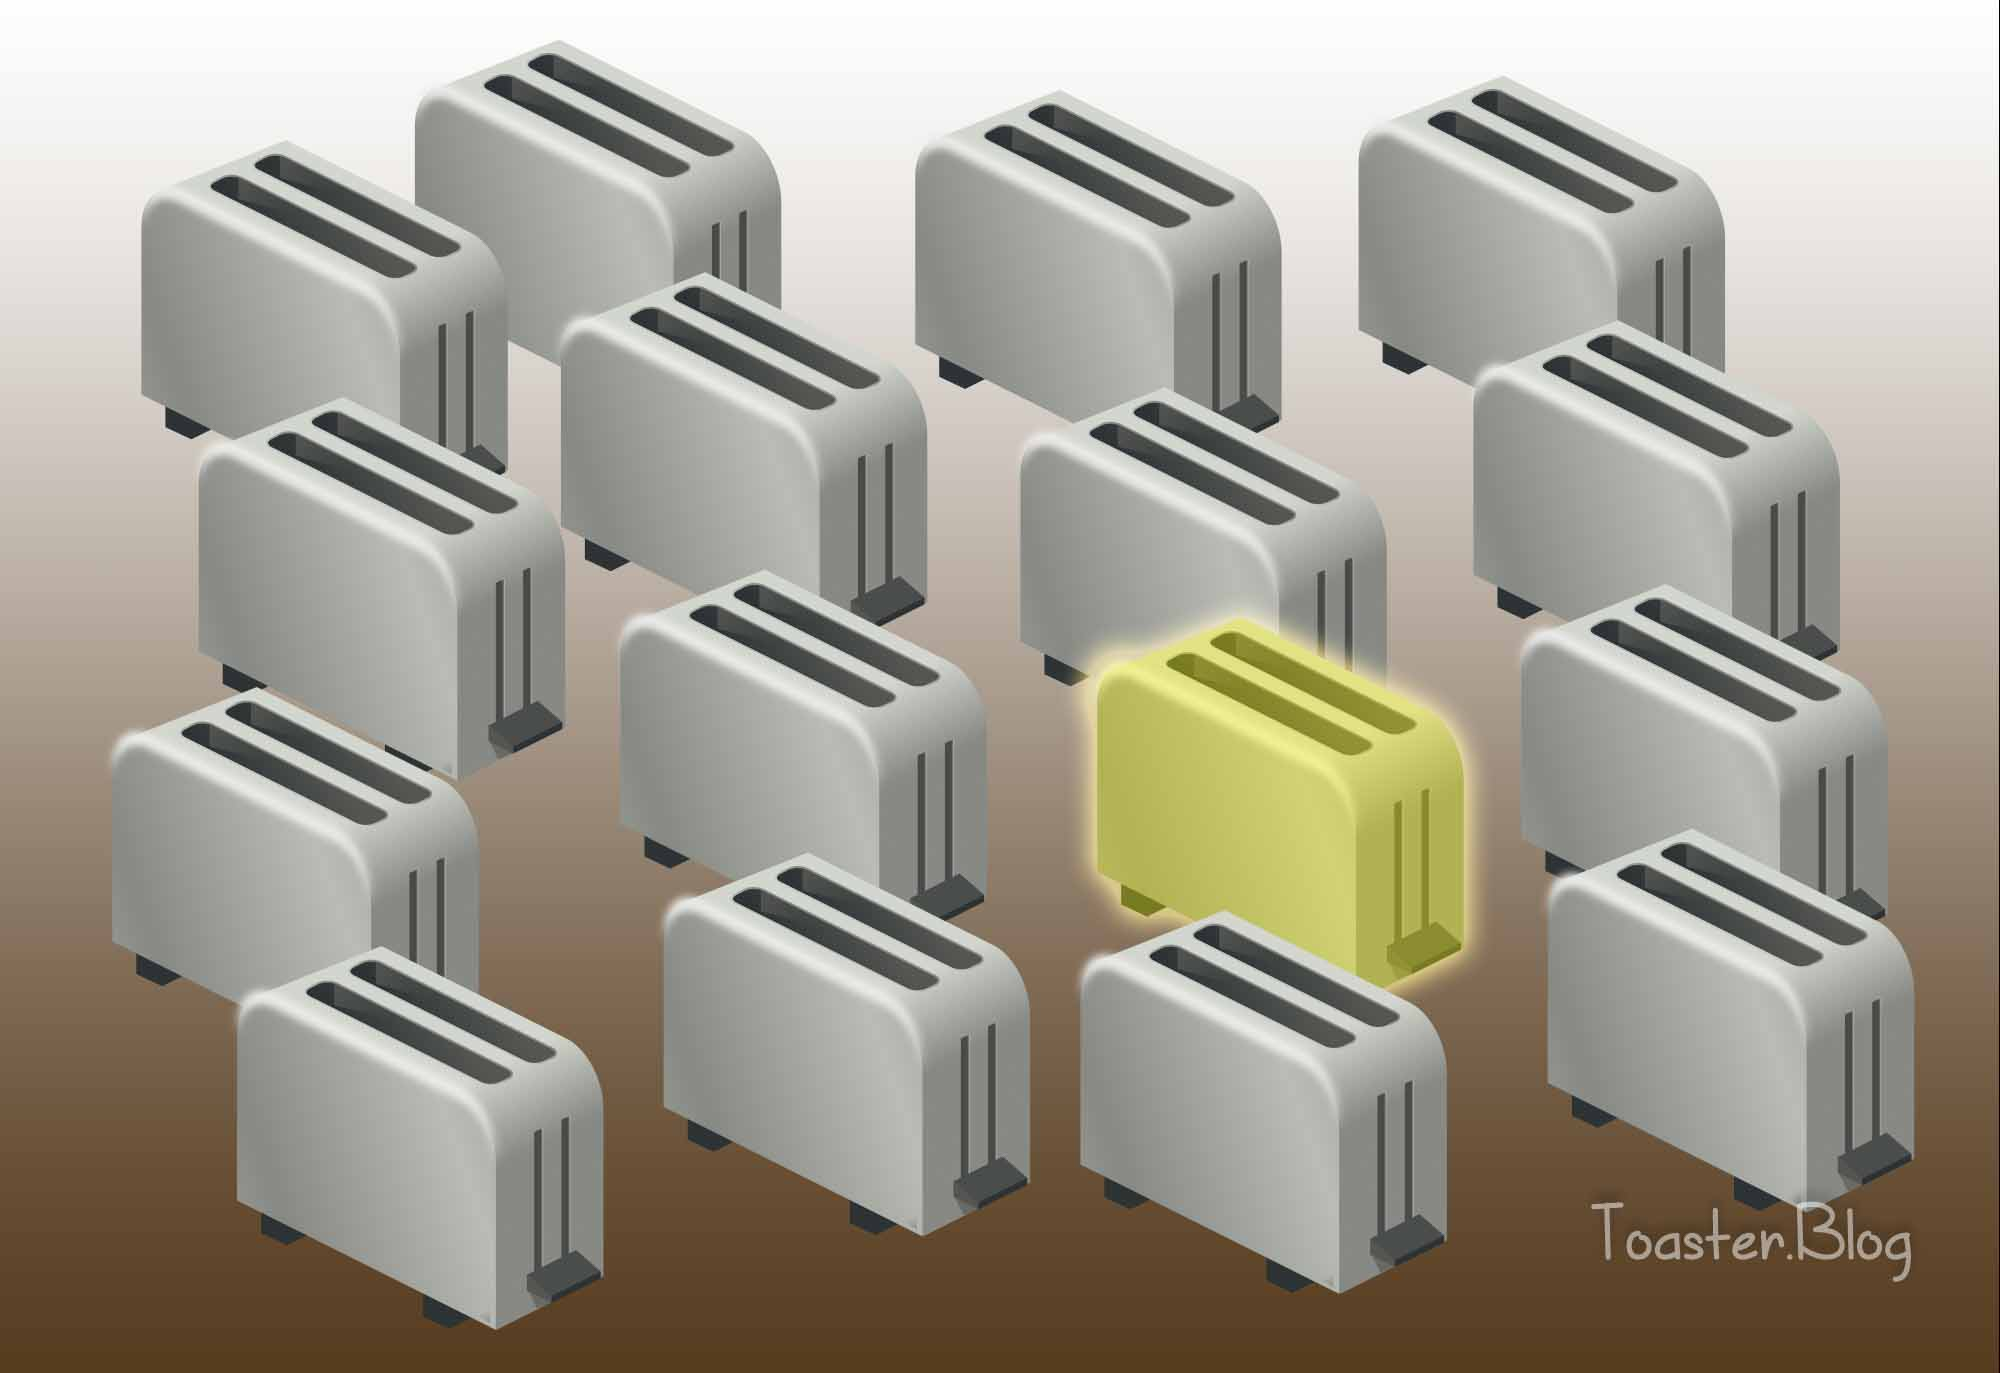 Toaster brands